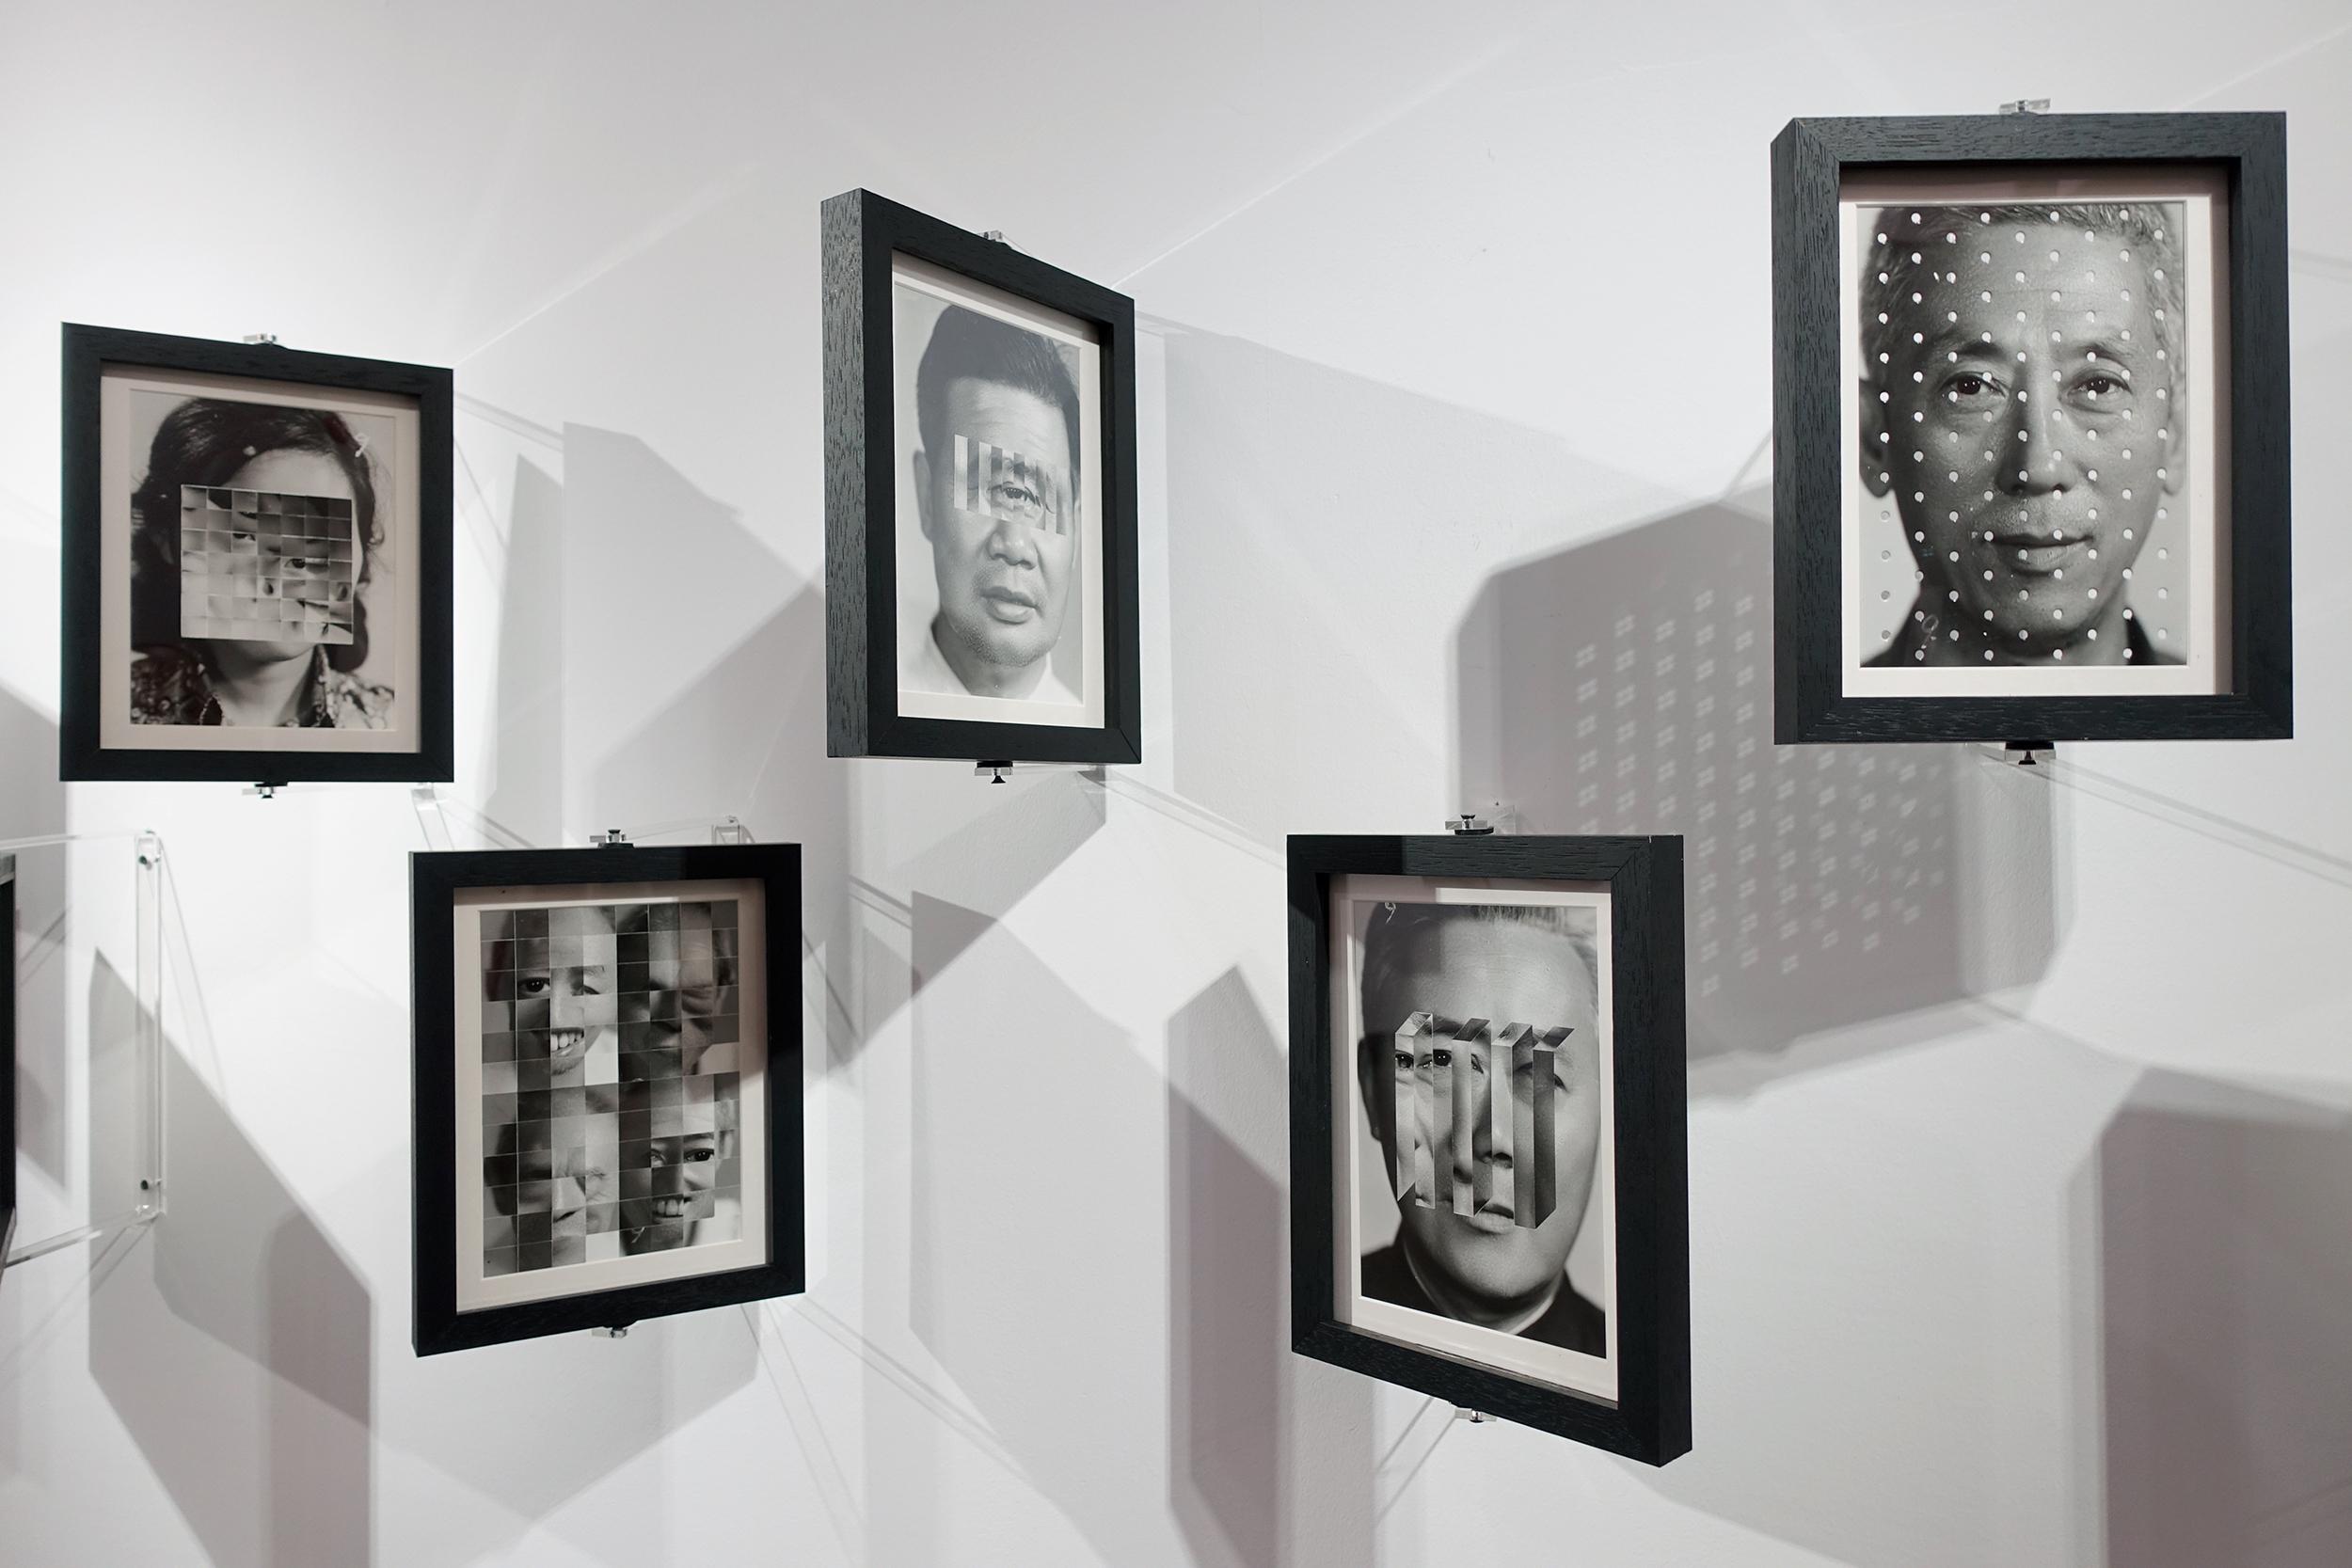 2017-12 Guangdong Museum of Art Image Triennial - KKTS No more No Less-BD.jpg